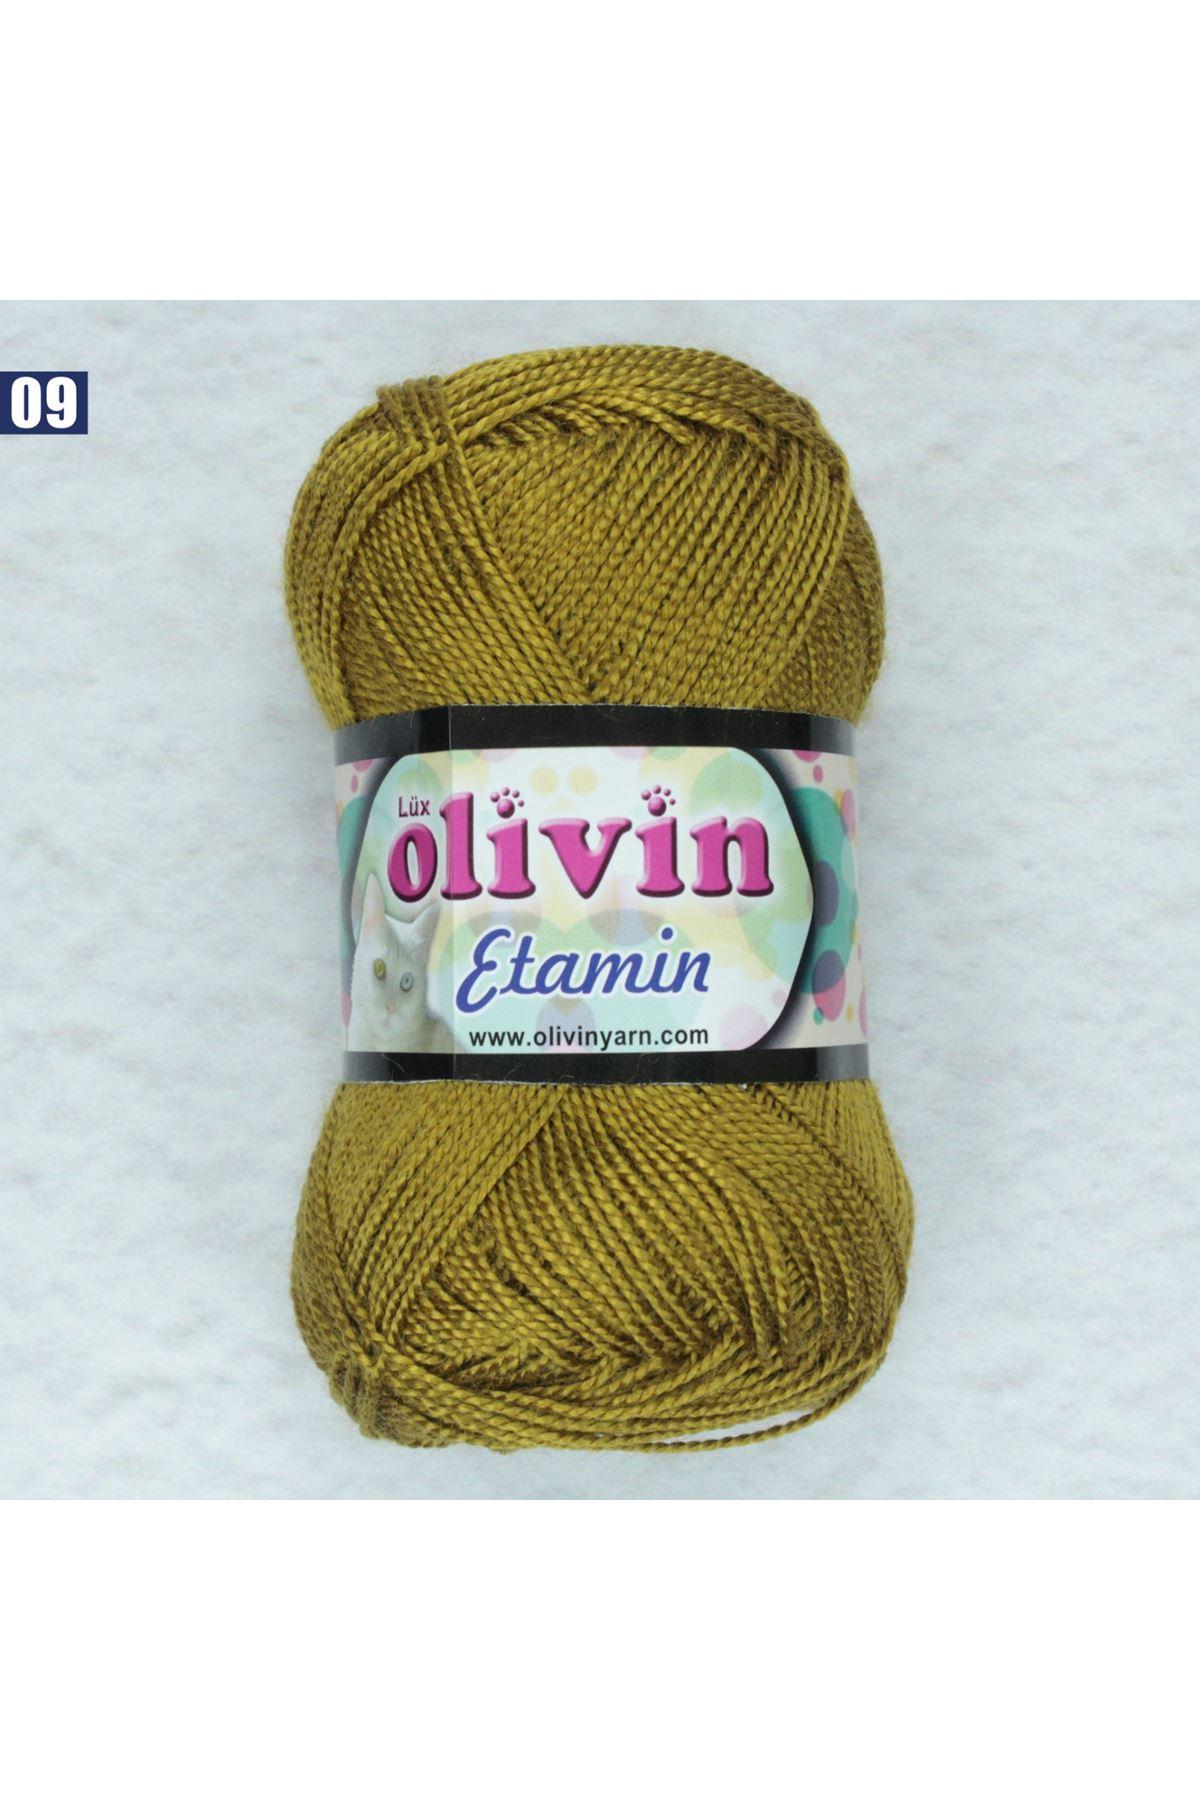 Olivin Etamin - 09